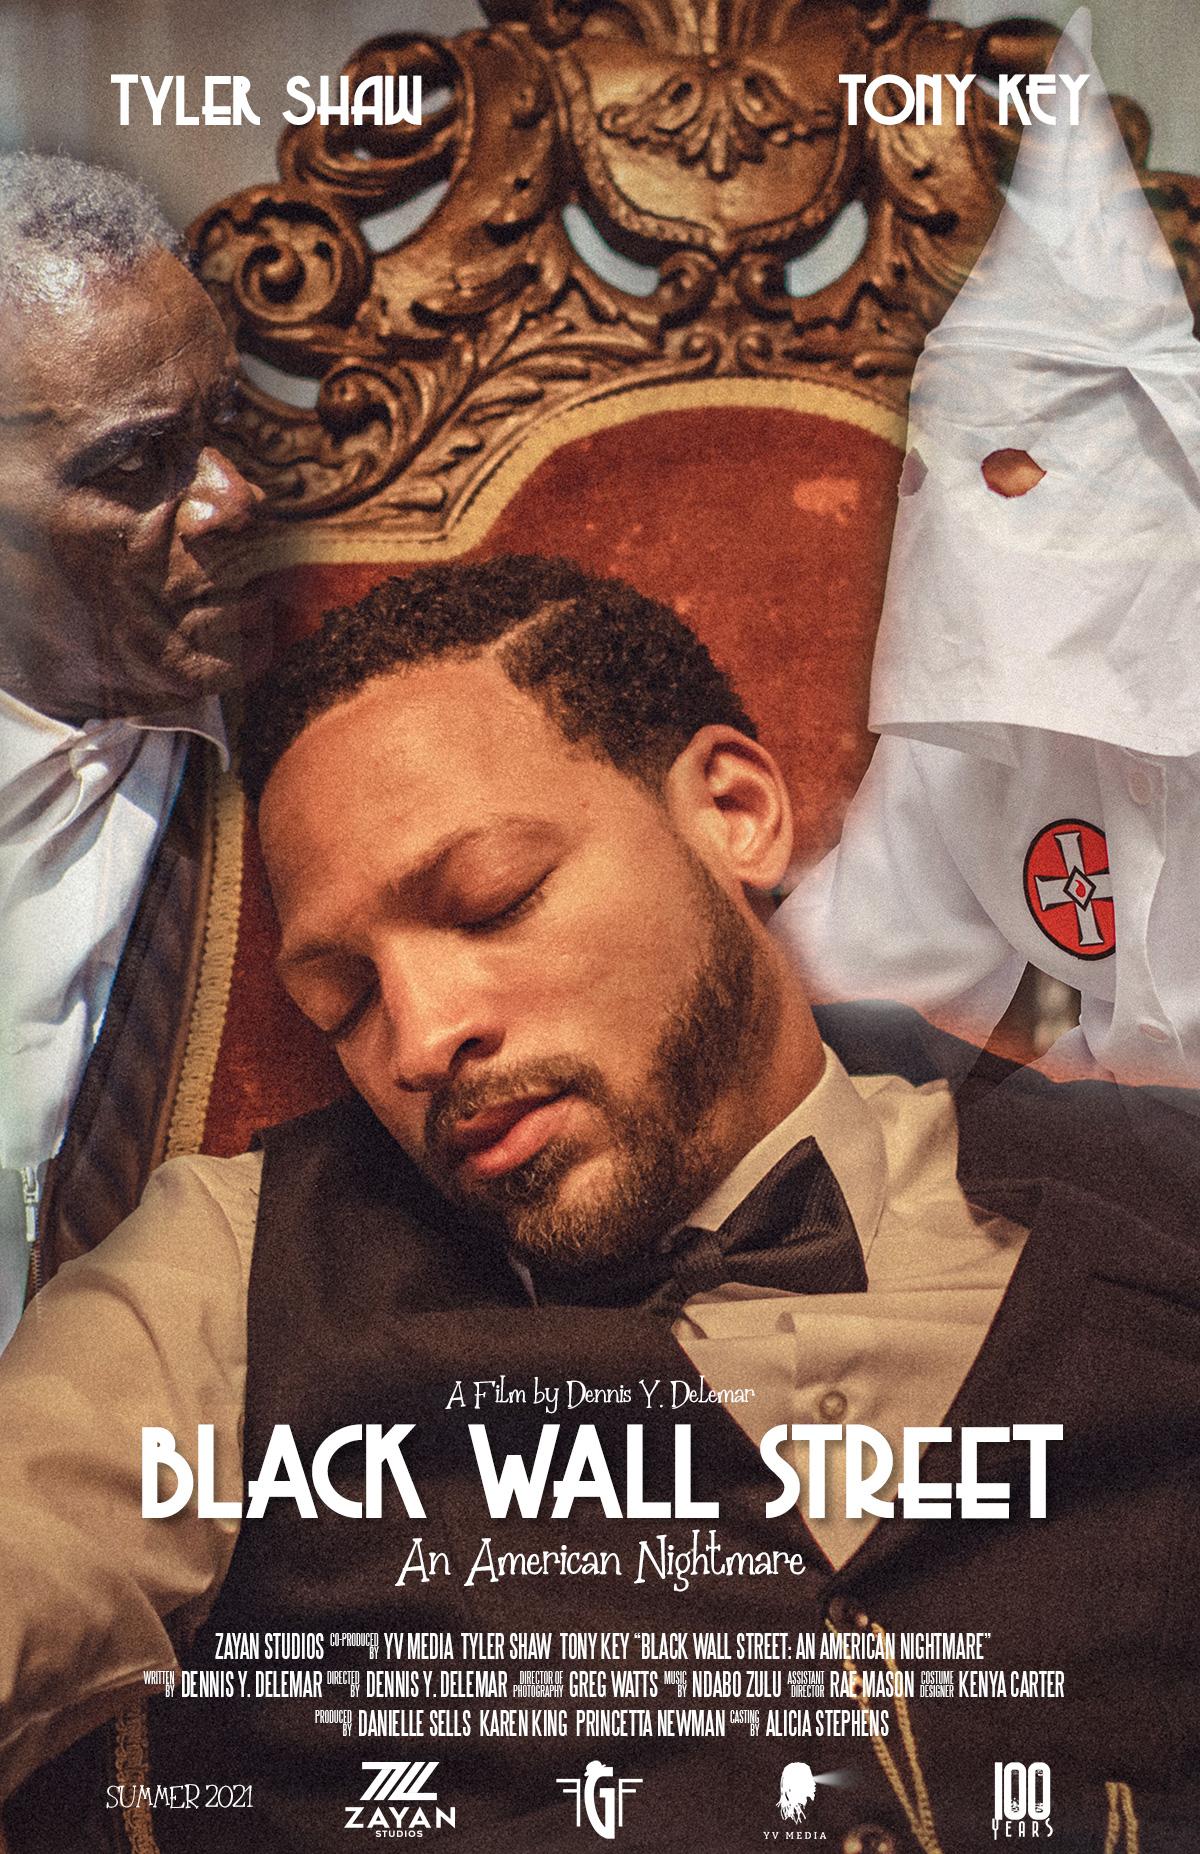 Black Wall Street An American Nightmare Poster